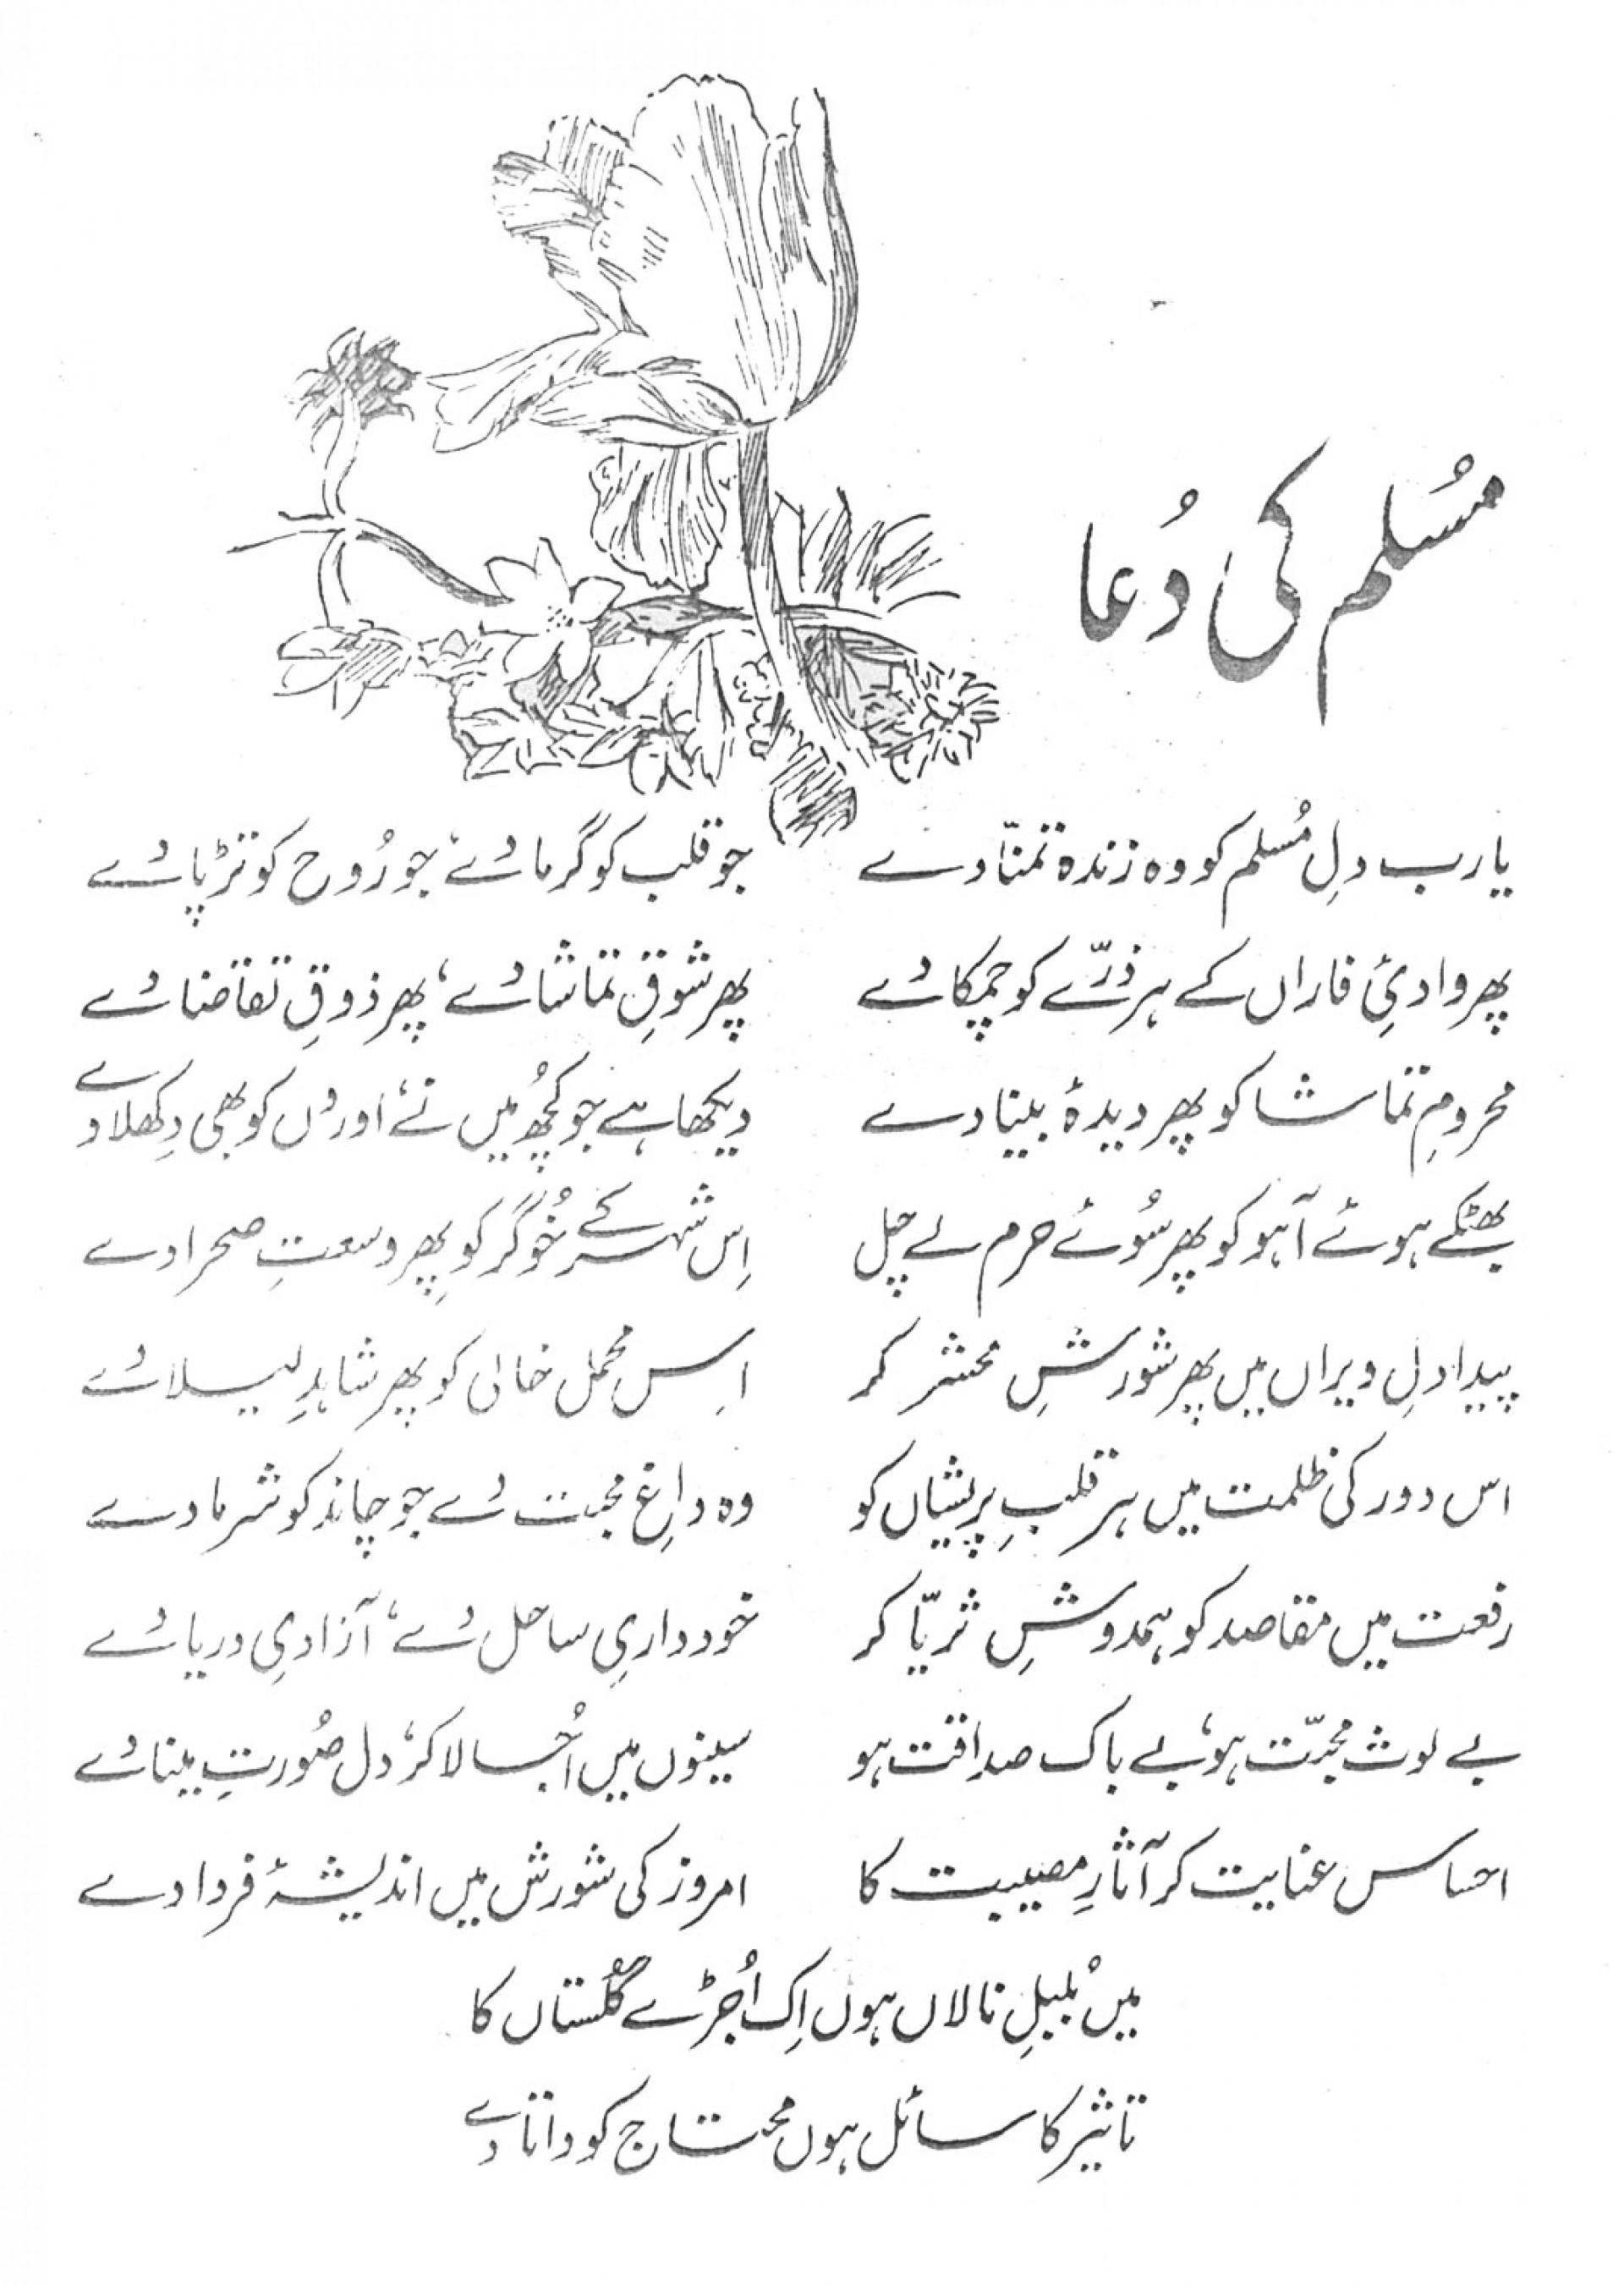 012 Essay Example Harkat Mein Barkat In Urdu Amazing On Topic Hai Short 1920